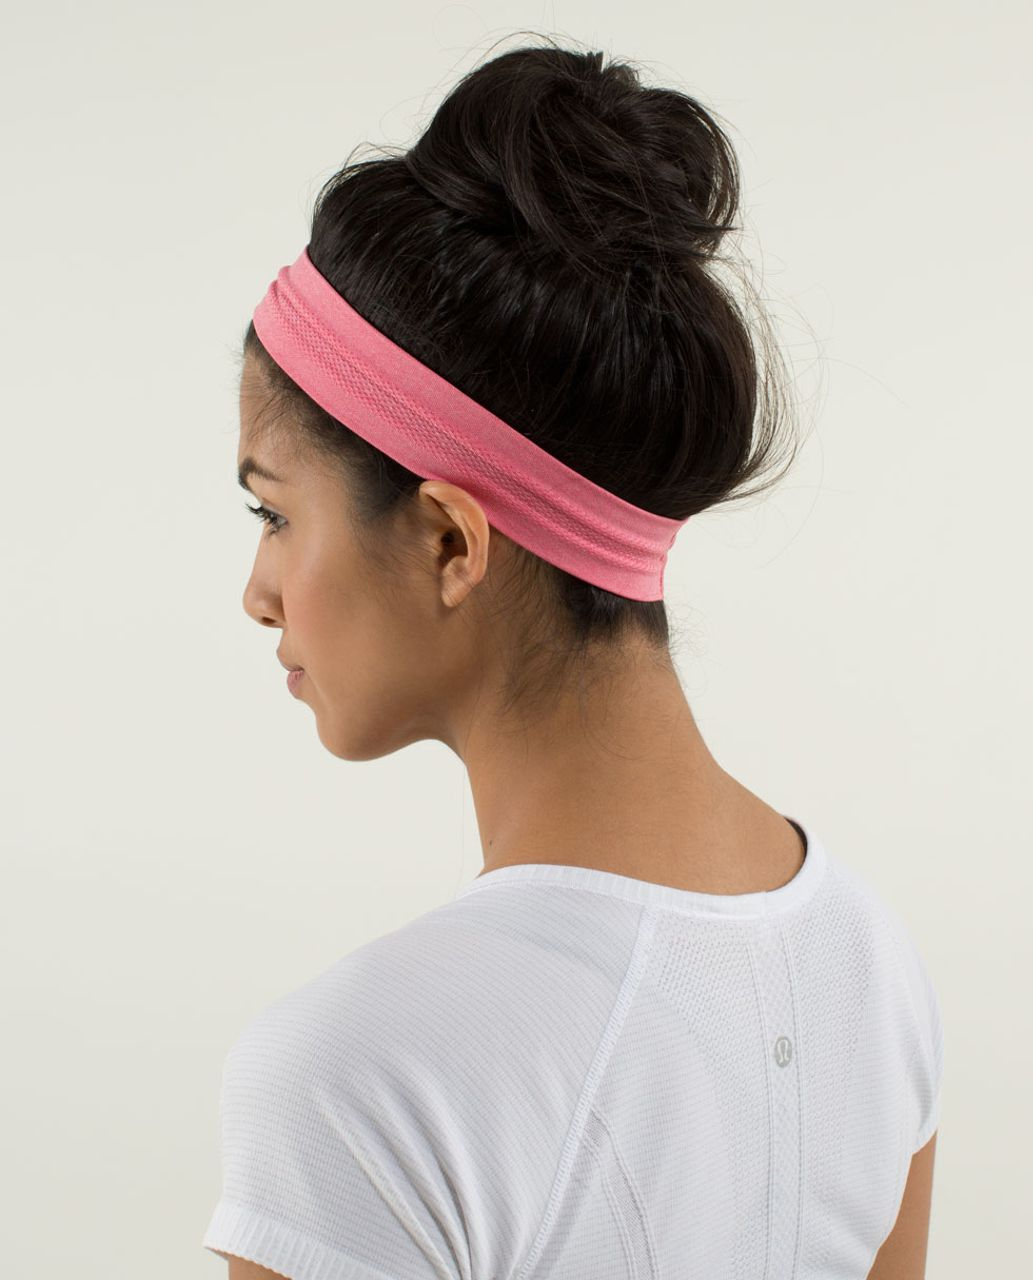 Lululemon Swiftly Headband - Heathered Guava Lava